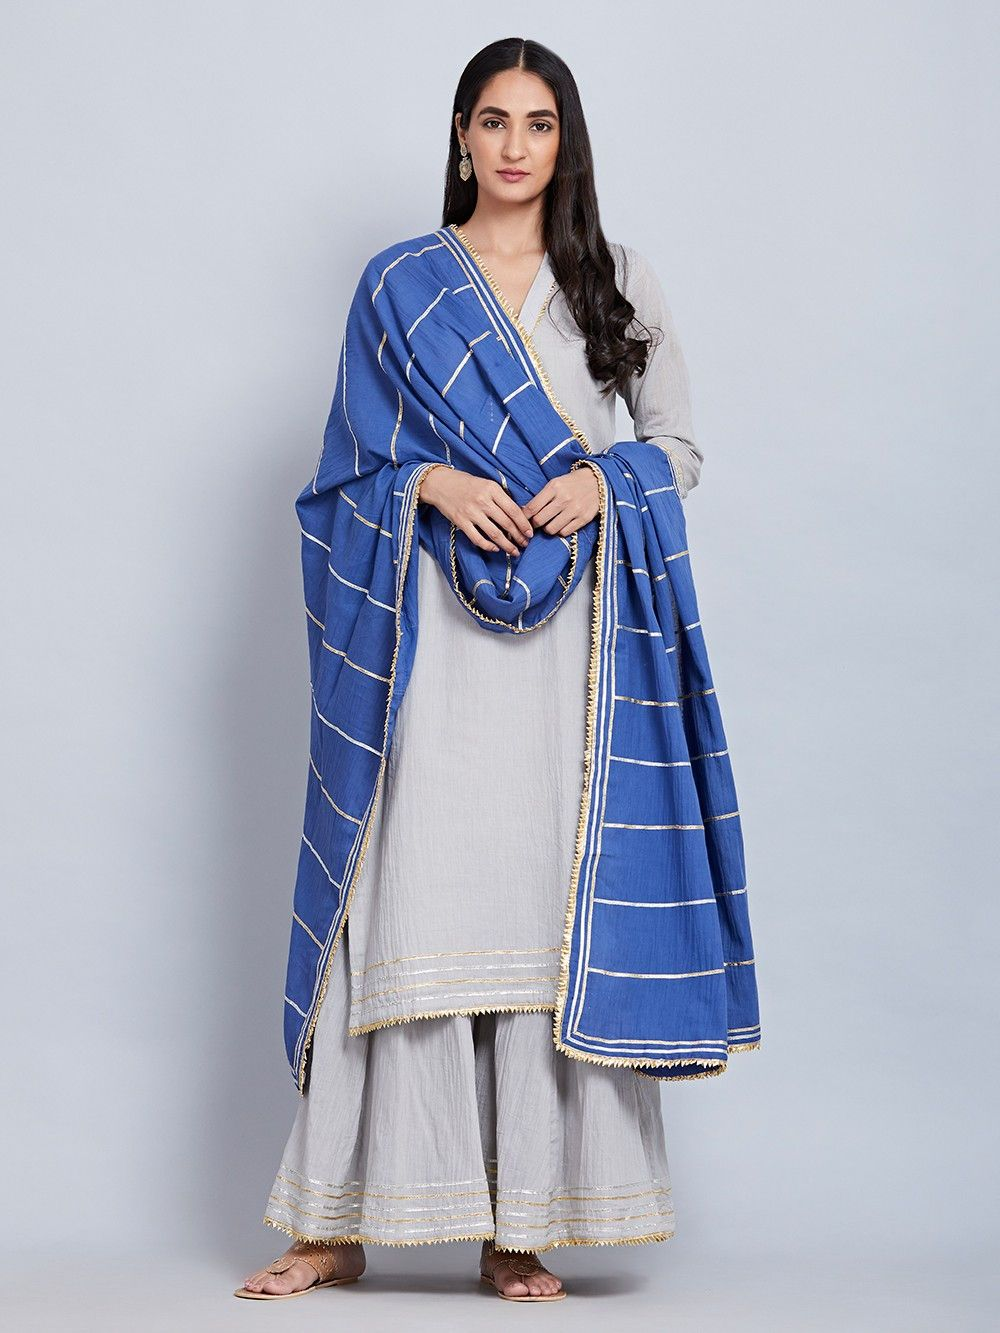 de9338f99e Buy Grey Cotton Mulmul Kurta with Sharara and Blue Gota Dupatta - Set of 3  online at Theloom